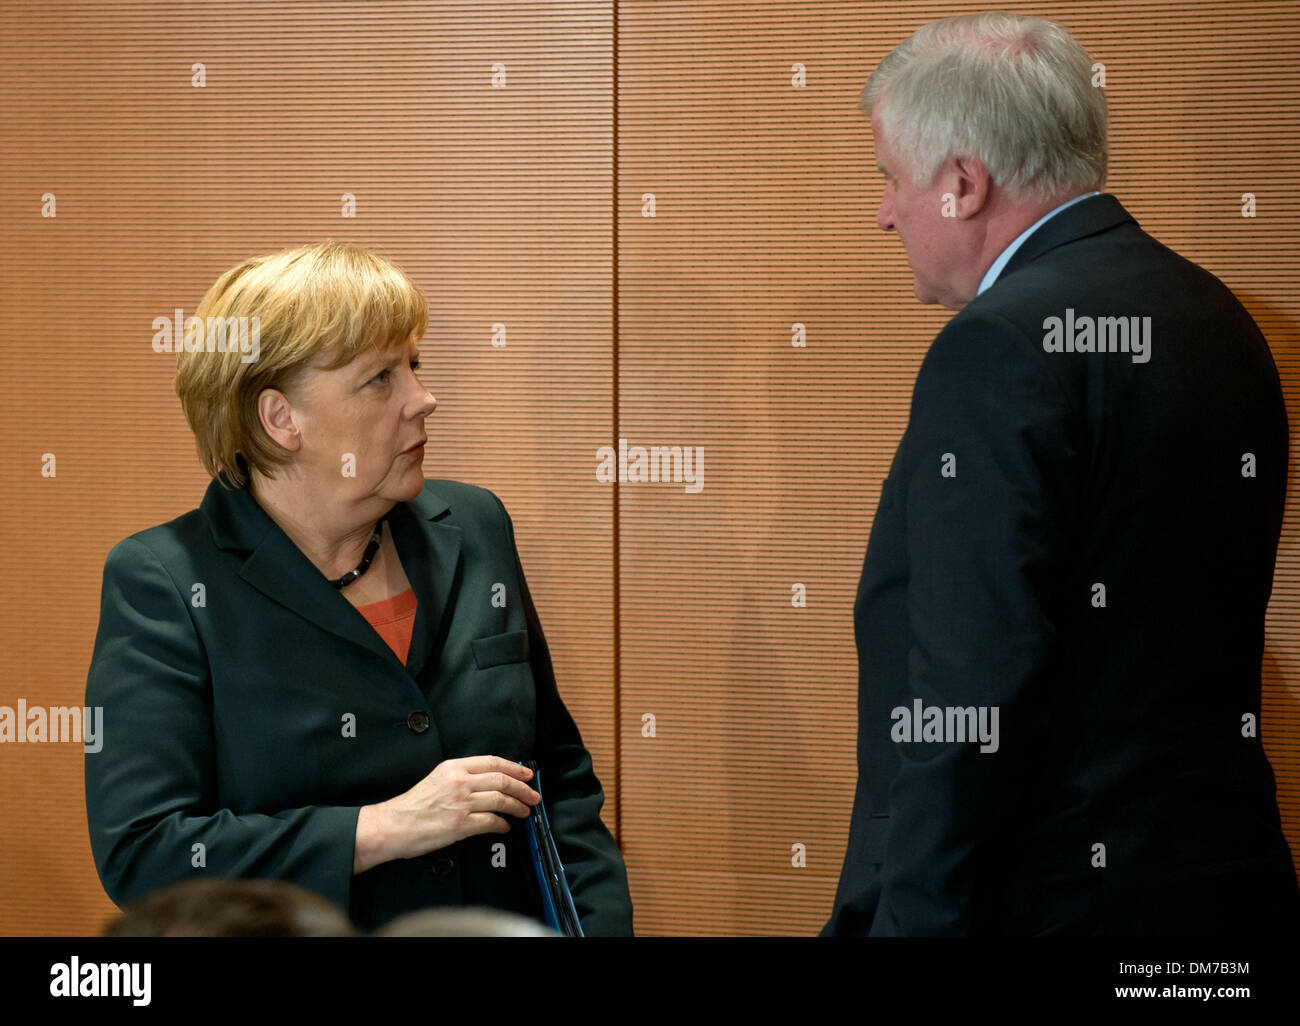 Berlin, Germany. 12th Dec, 2013. German Chancellor Angela Merkel (CDU) talks to CSU chairman and Bavarian premier Stock Photo